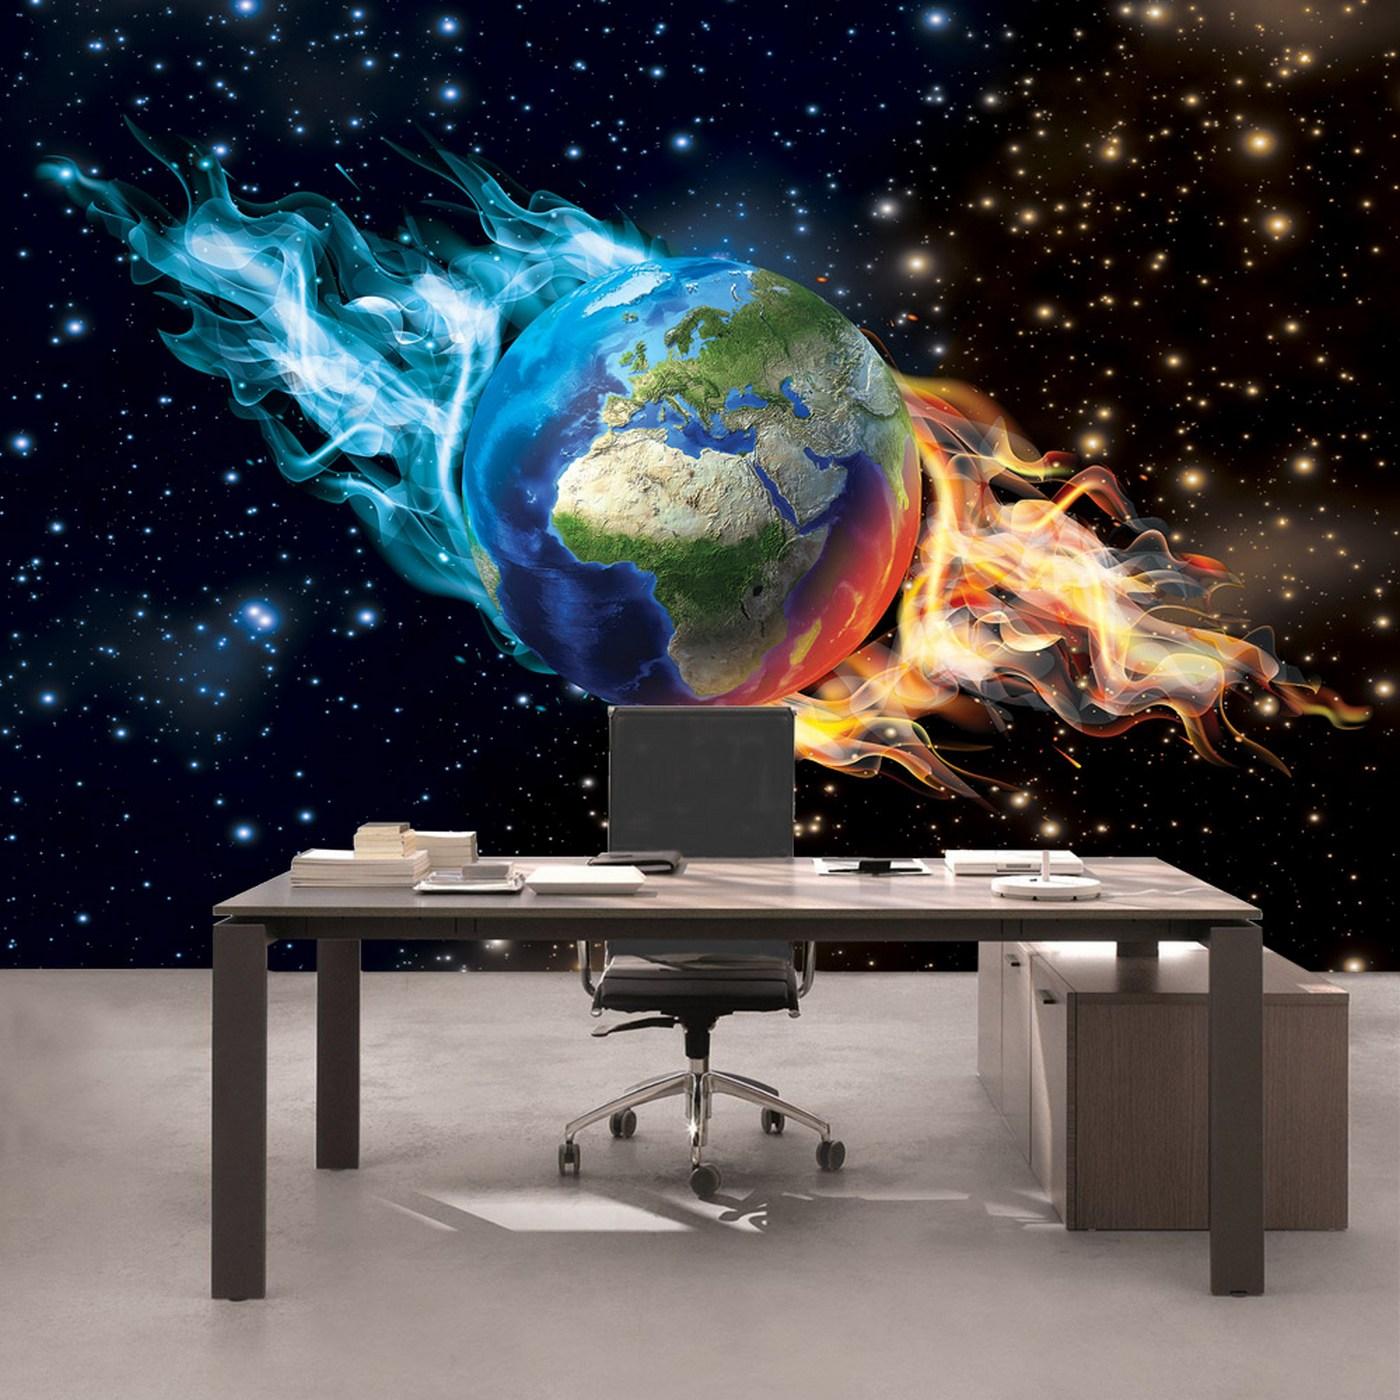 Vlies Fototapete 2437 - Welt Tapete Erde Welt Weltraum Sternenhimmel  Weltraum Galaxie schwarz